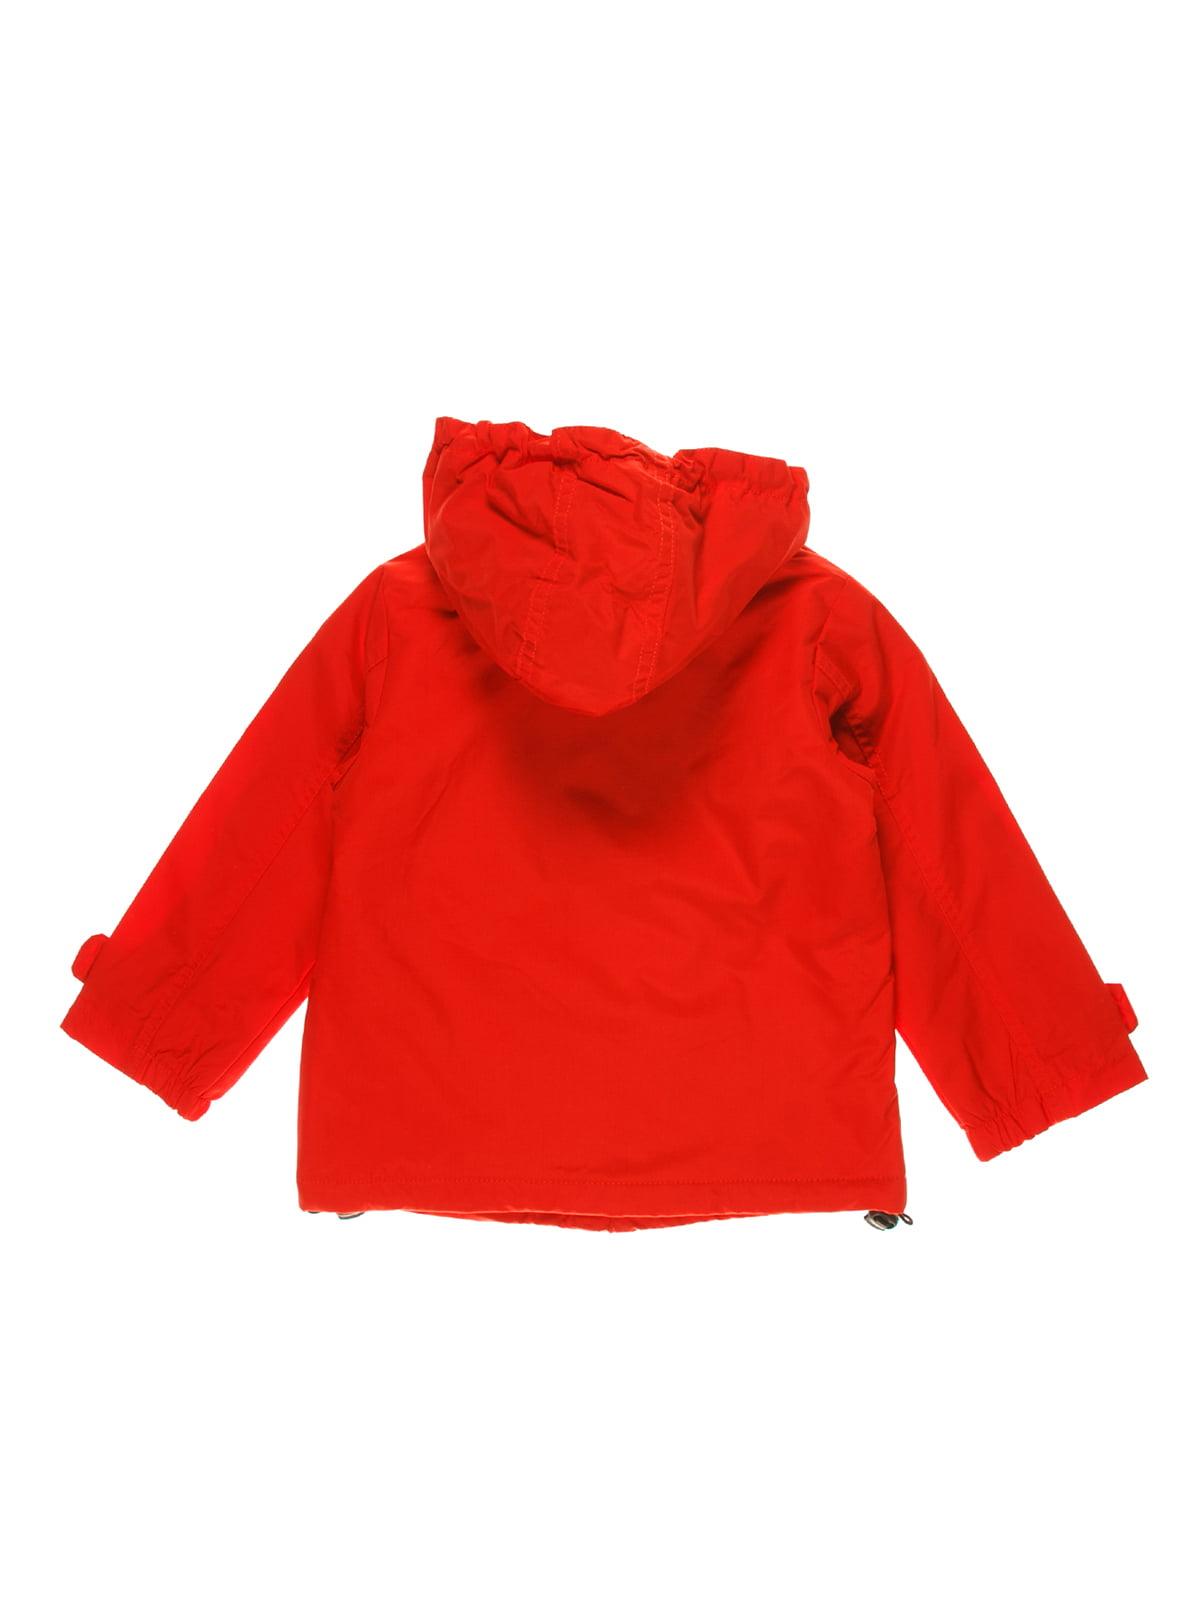 Куртка красная   4103357   фото 2